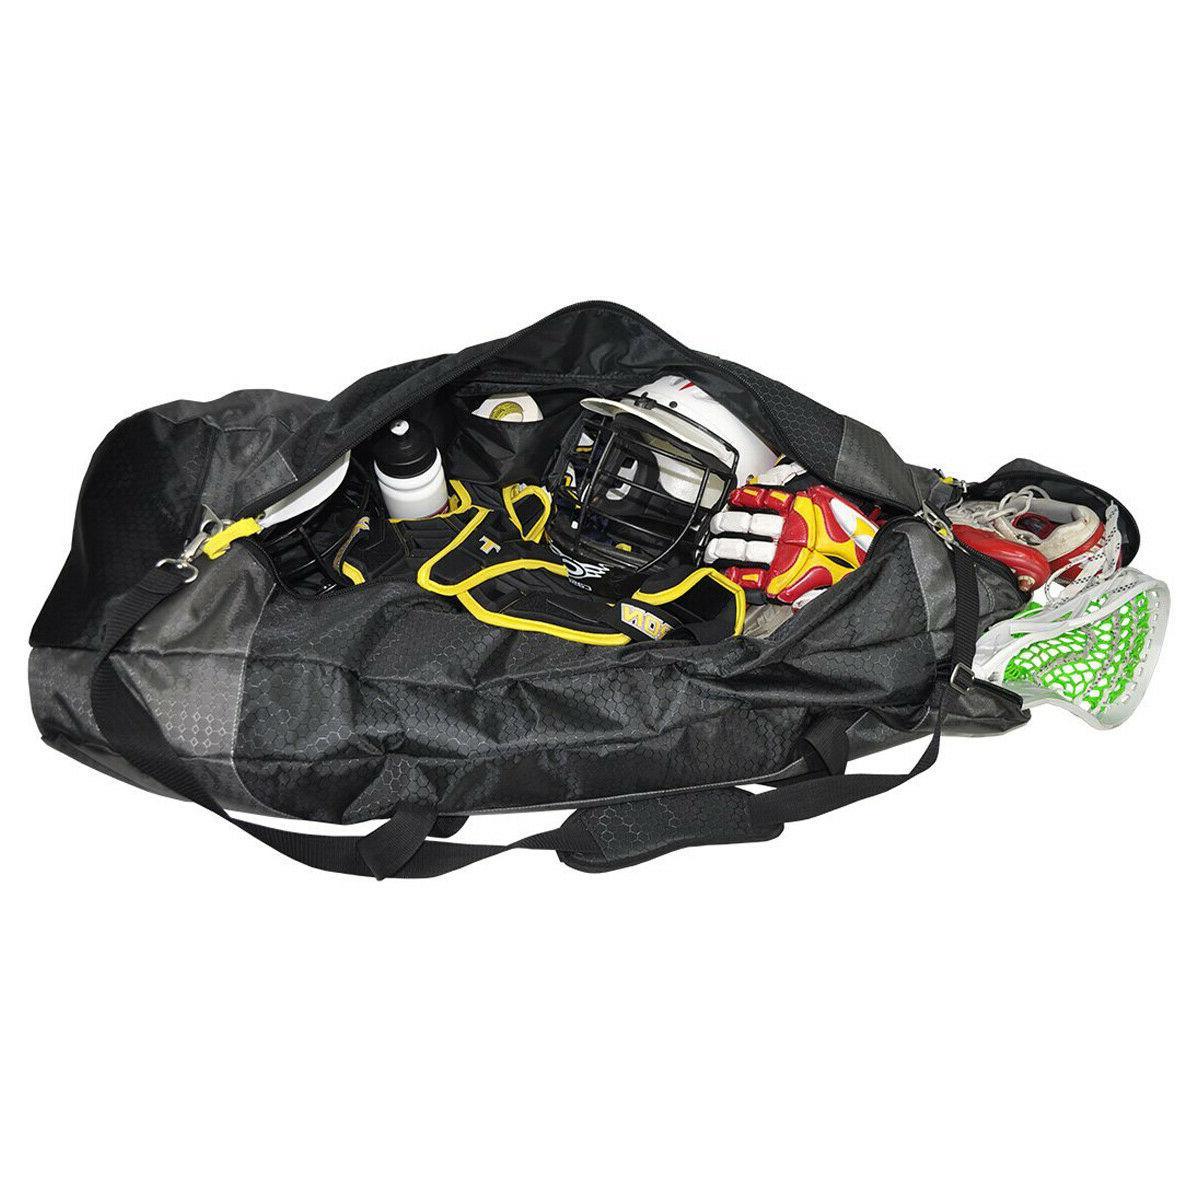 Tron LX Tron Lacrosse Equipment Bag Black, Gray Lists $80